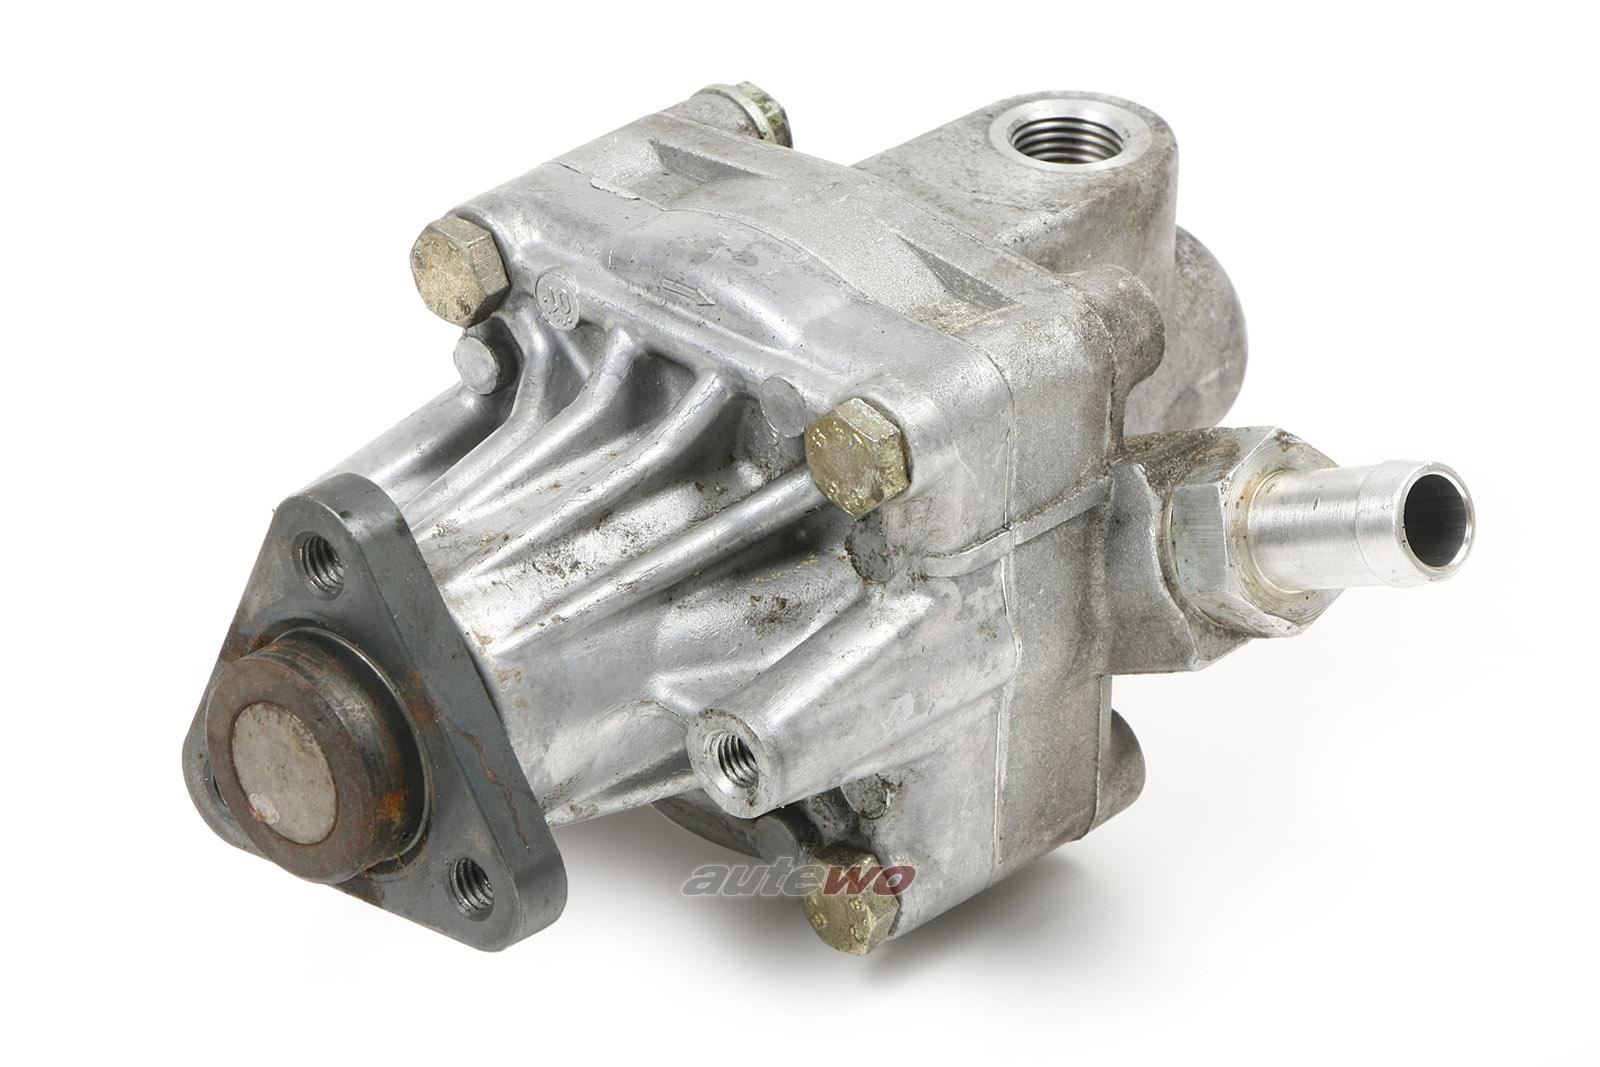 8D0145156X 8D0145156 Audi/VW A4 B5/Passat 4/6 Zylinder Servopumpe